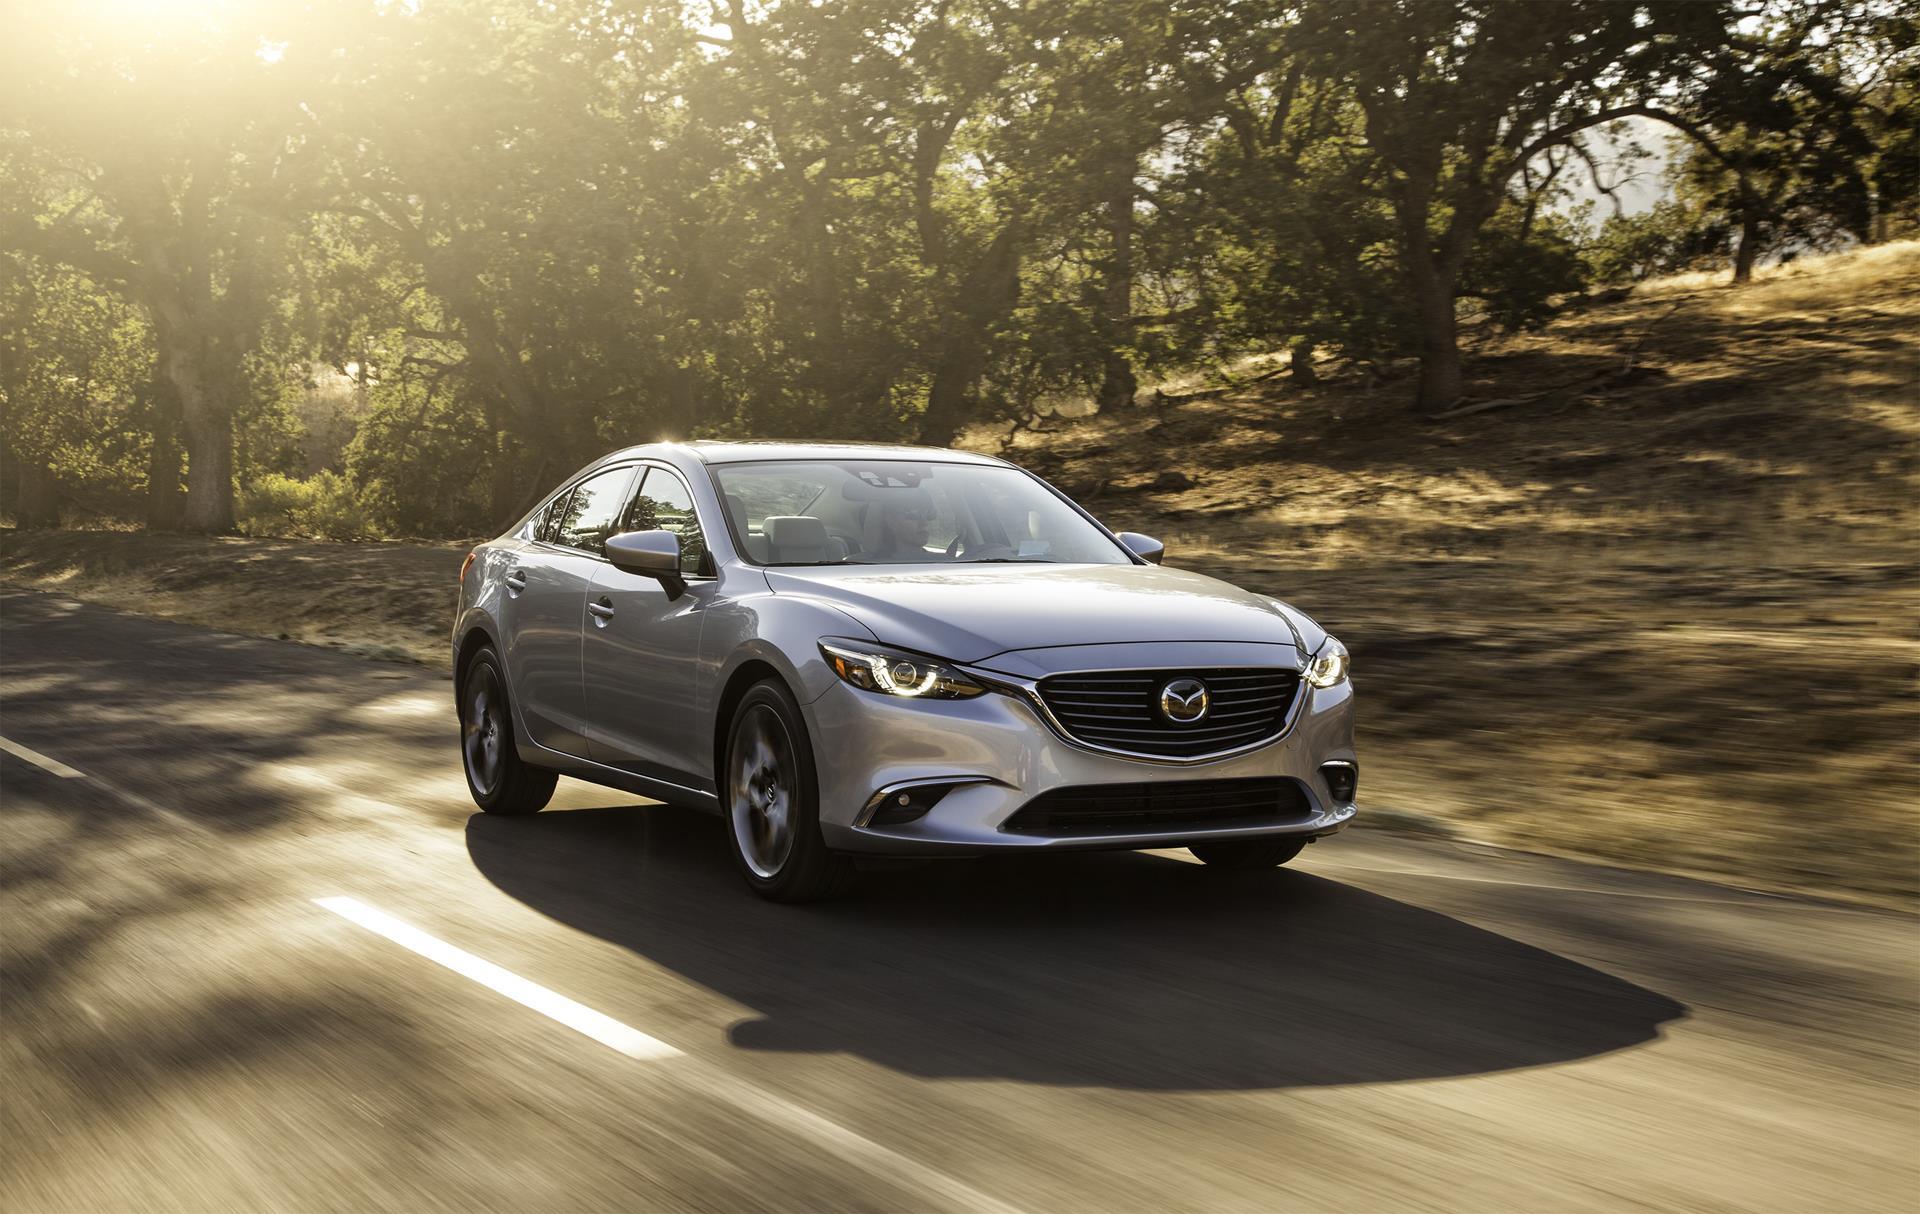 2016 Mazda 6 News and Information